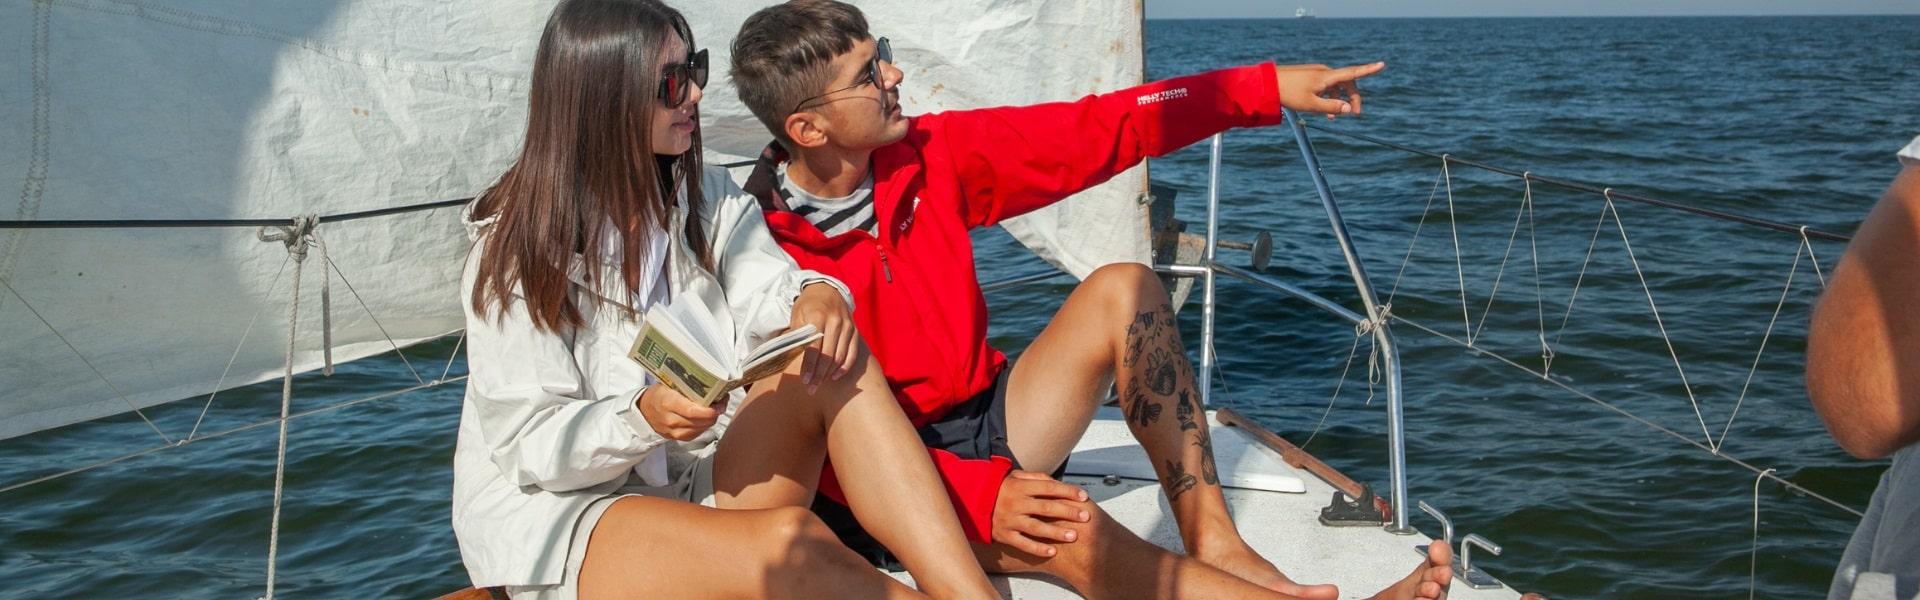 Аренда яхты «Ольга Red» в Херсоне